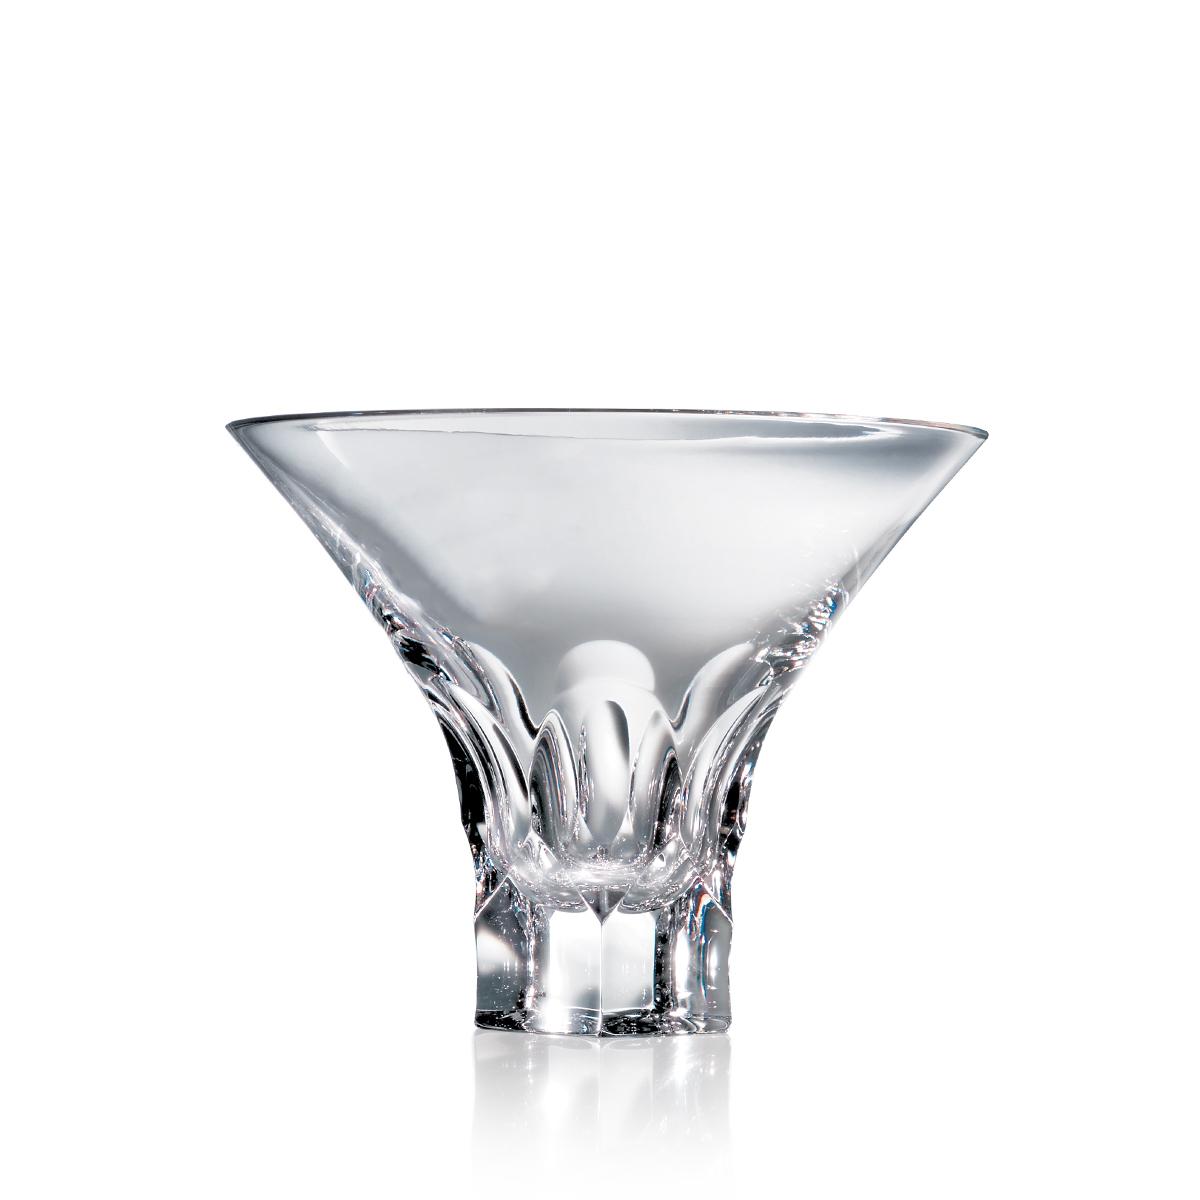 Steuben Tortoise Stemless Martini Glass, Single